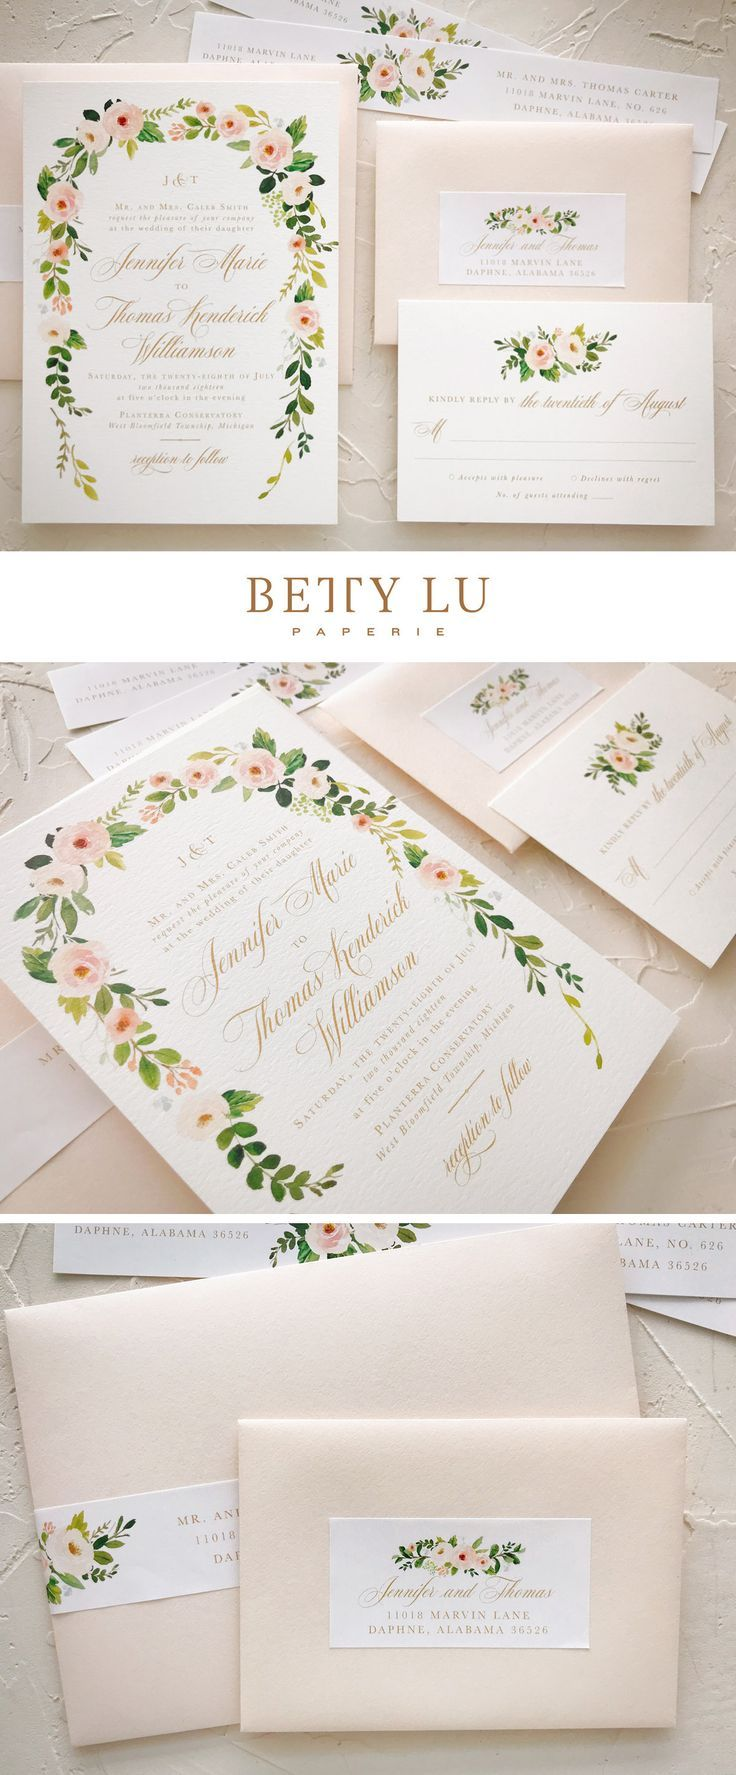 Blush Peach Wedding Invitations Elegant Wedding Invitation